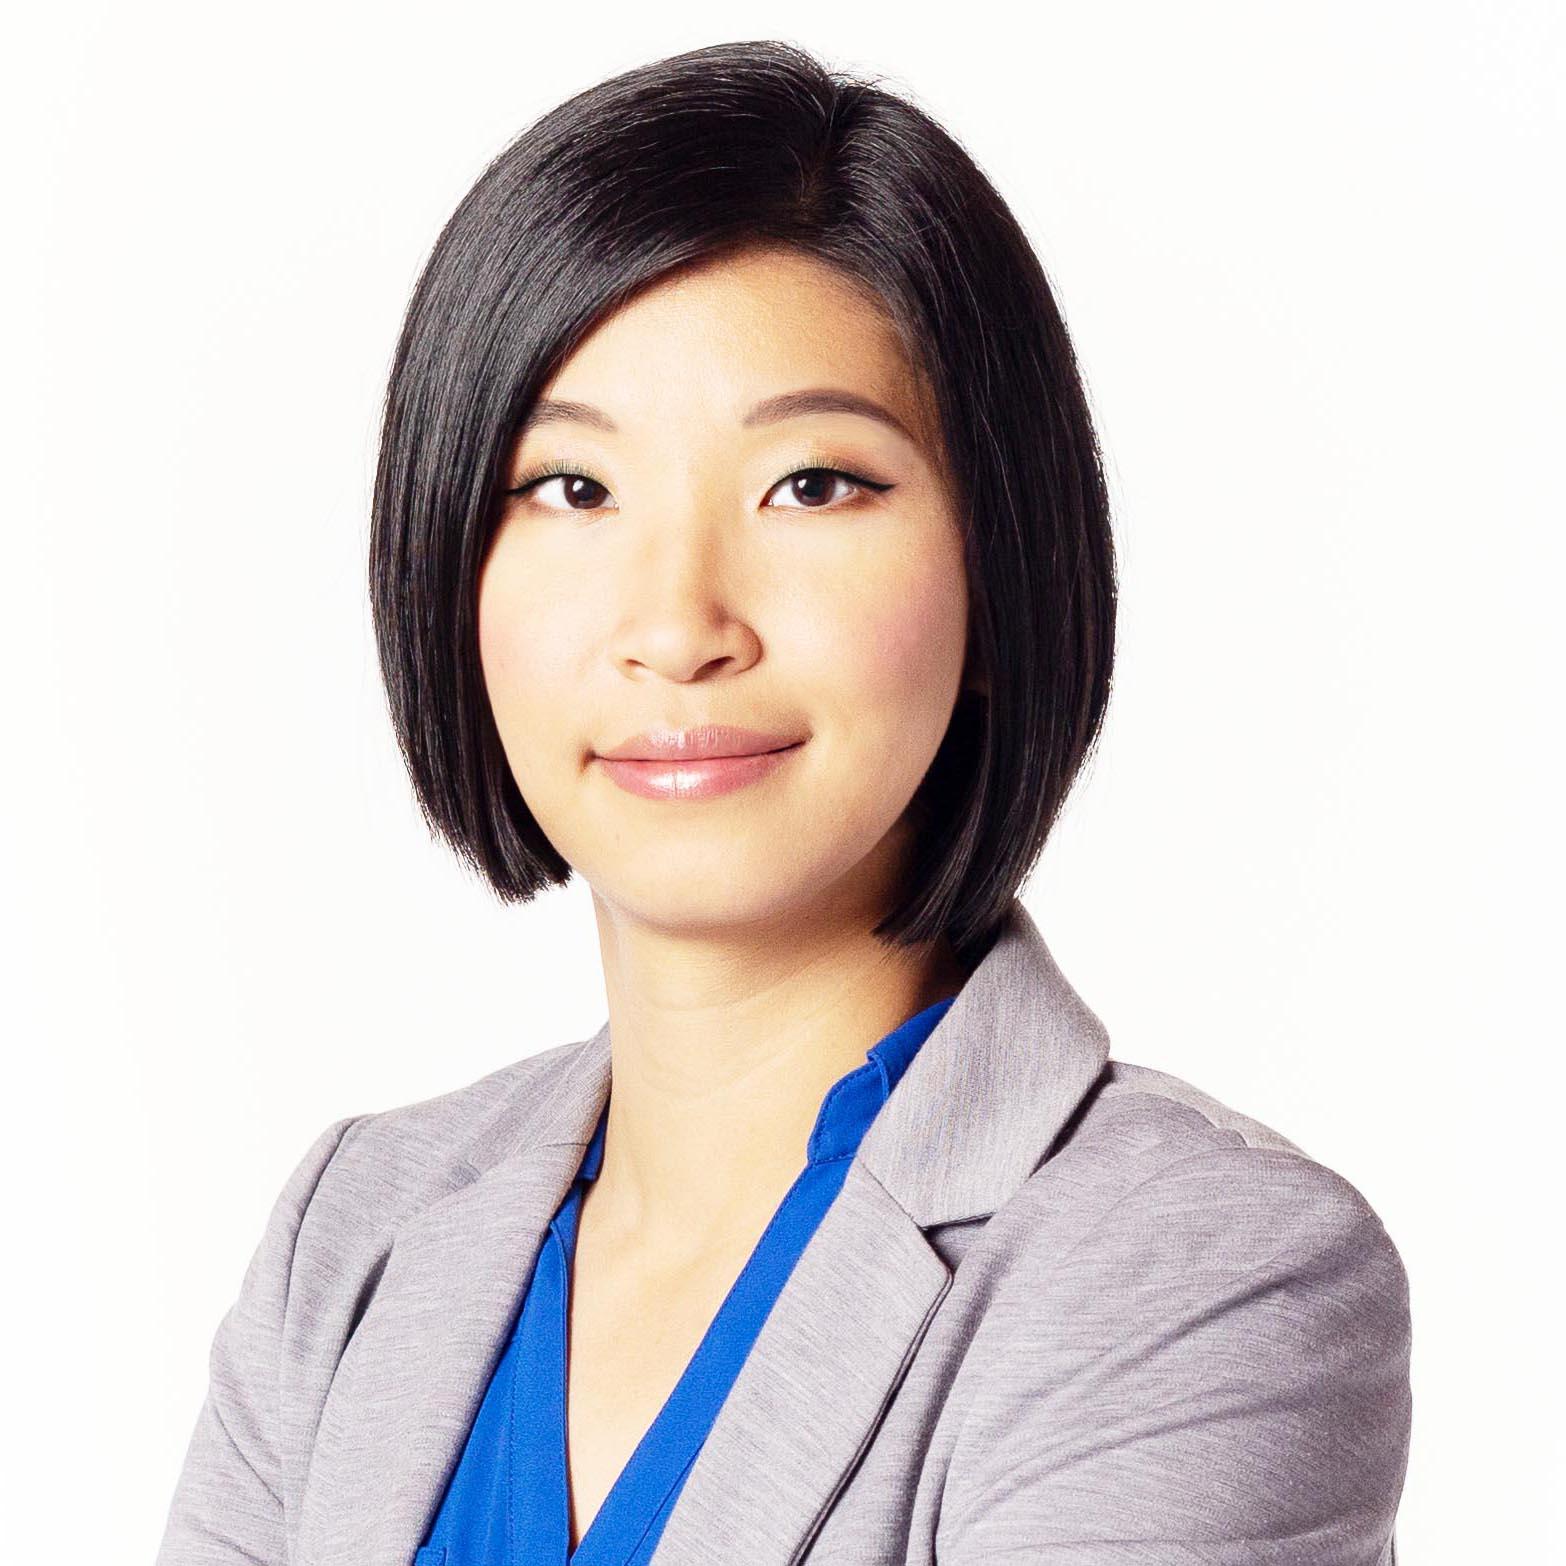 Picture of Sandy Gum 顧瑜珊